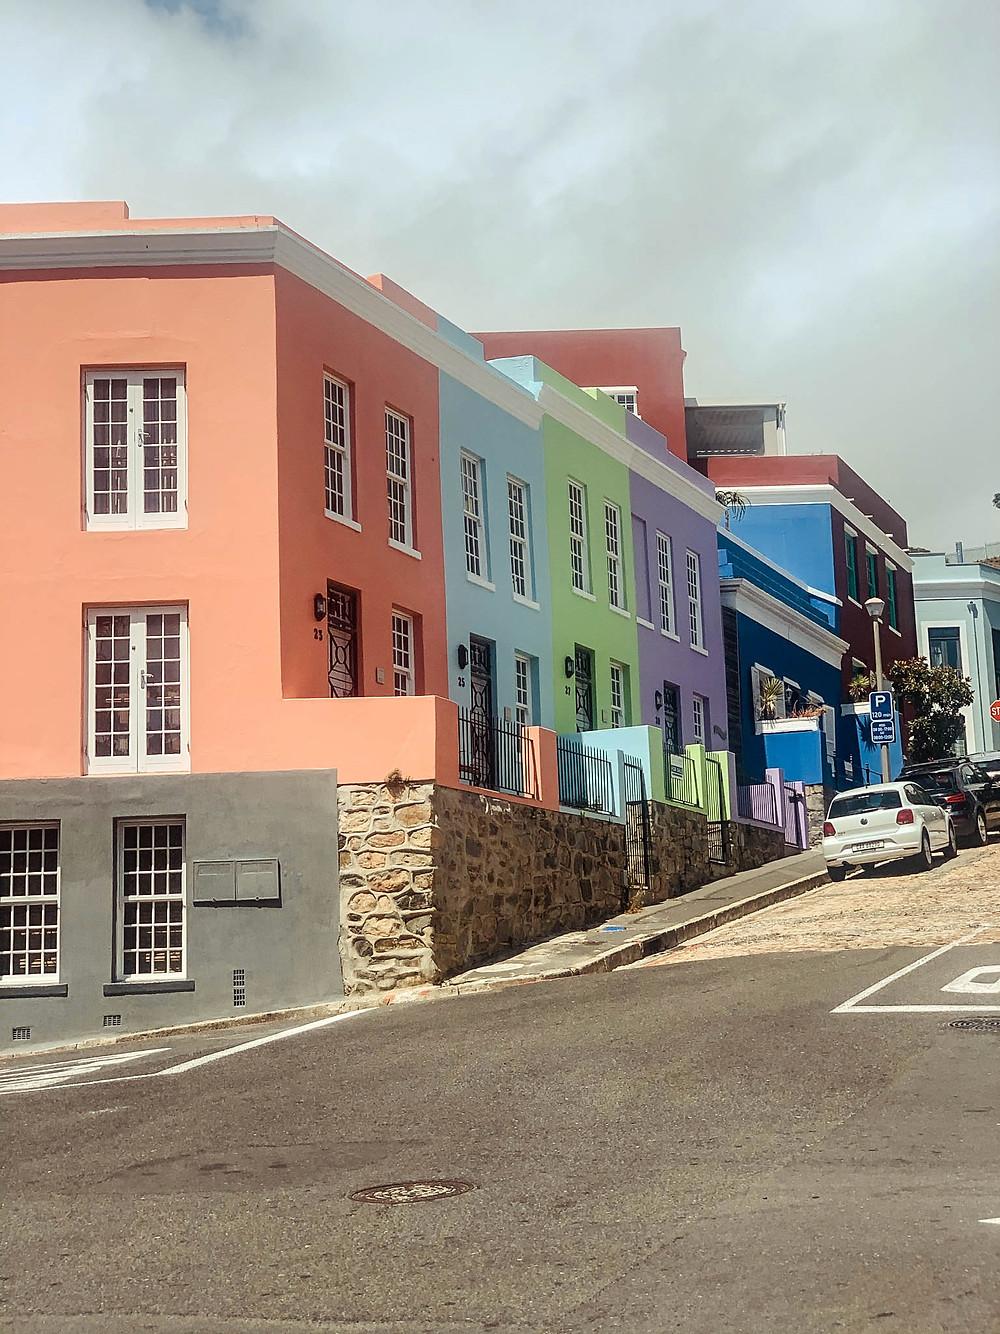 Beautifully restored row houses in Cape Town's De Waterkant neighborhood